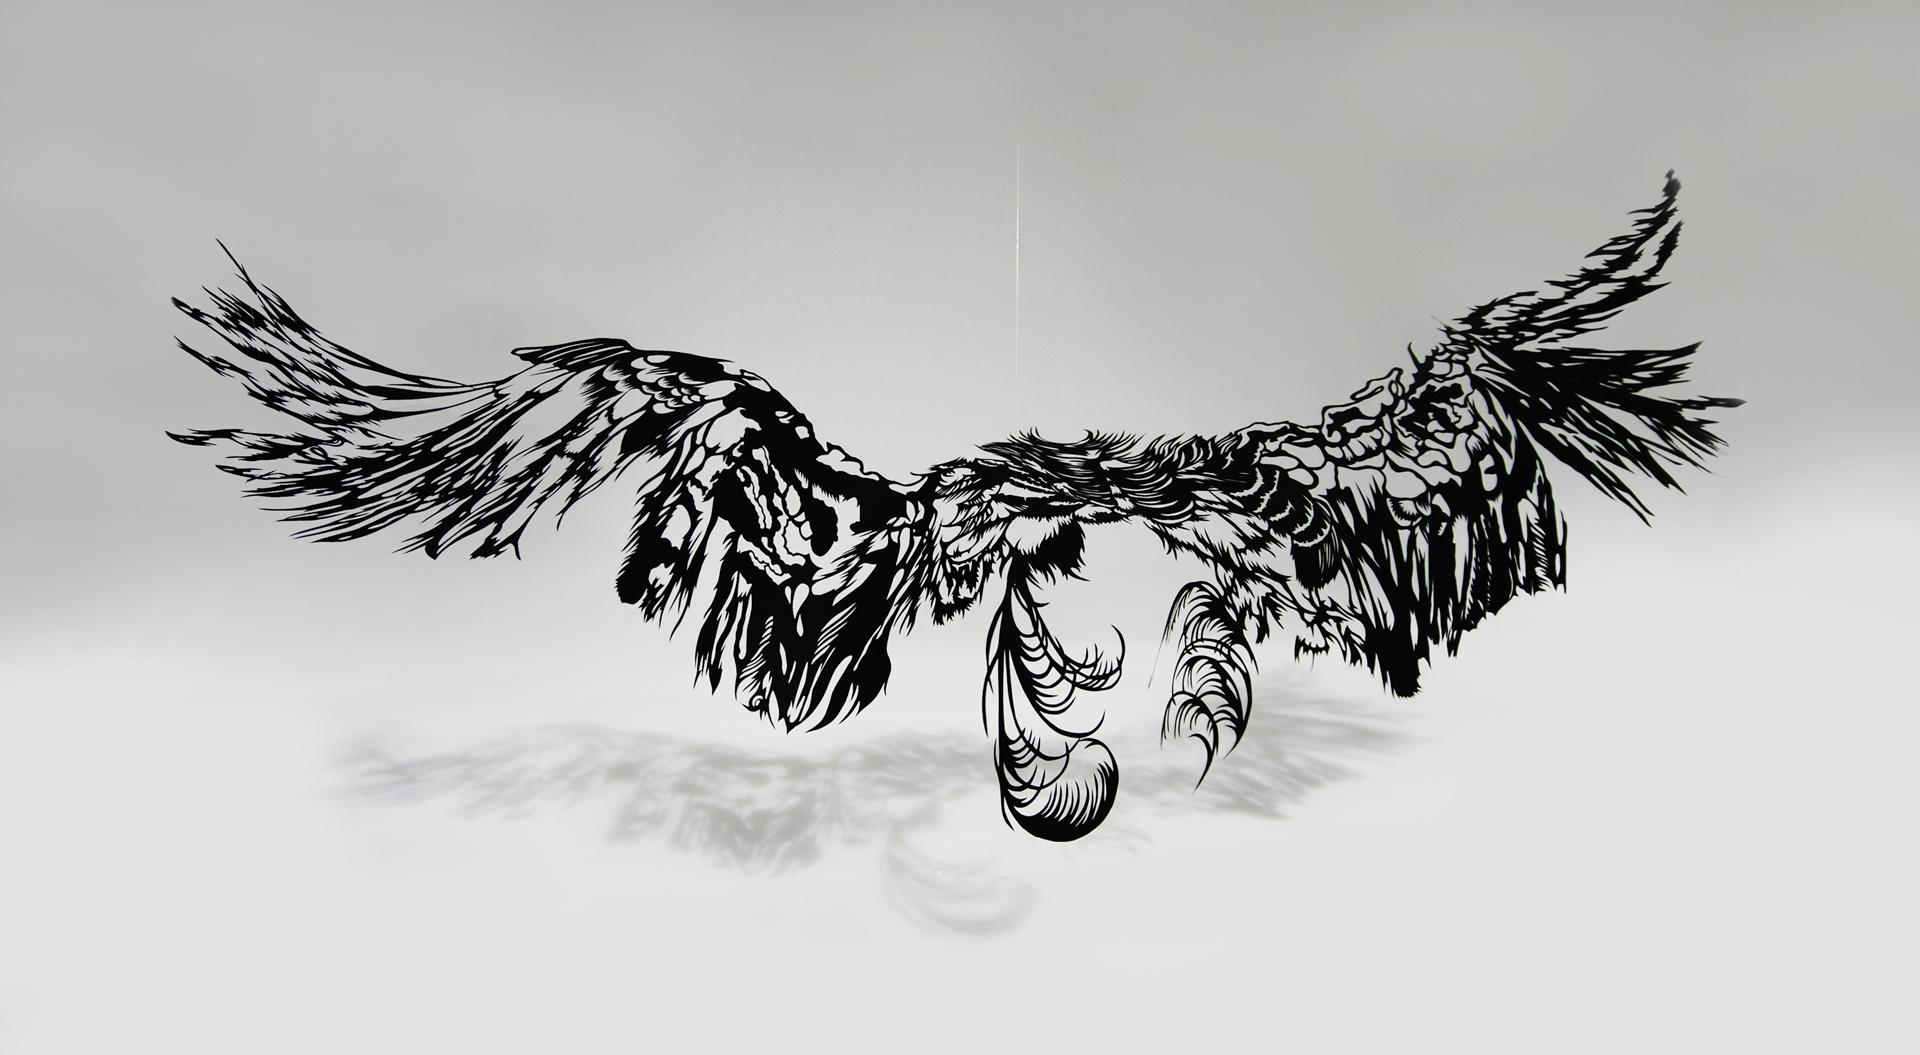 Japanese Art - Paper Cut Art migration sculpture